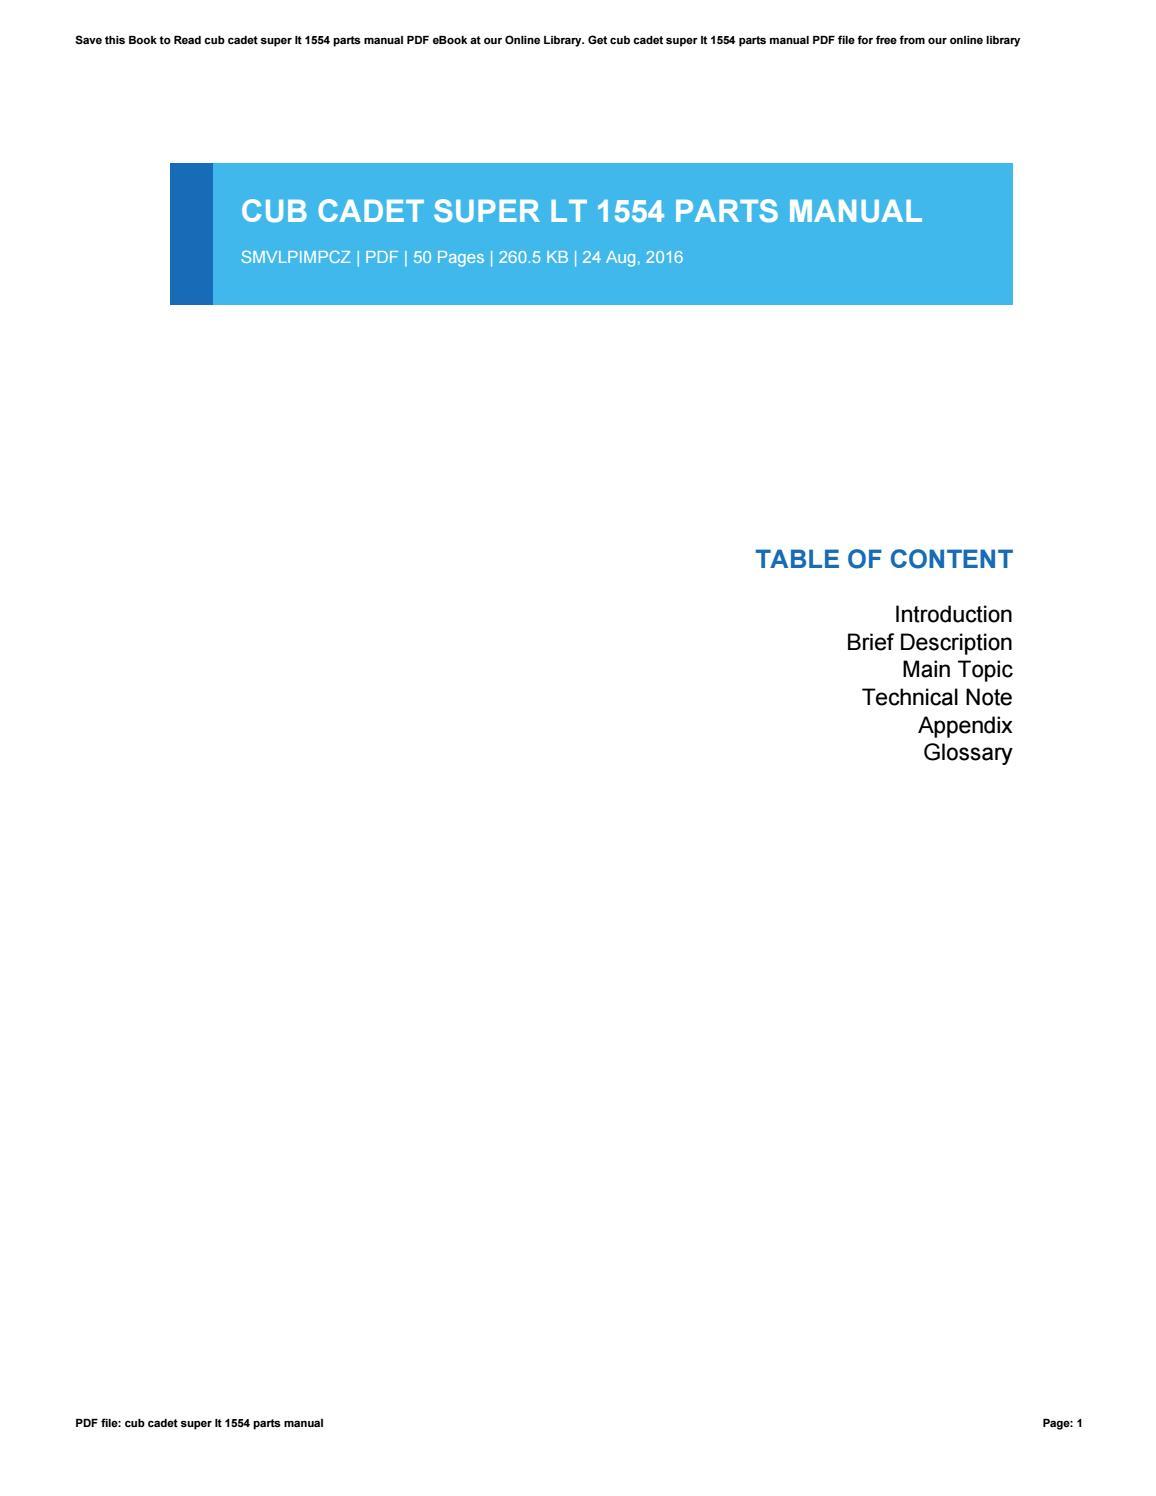 Cub Cadet 1554 Parts Diagram Worksheet And Wiring Slt1554 Super Lt Manual By Patricianeal2183 Issuu Rh Com